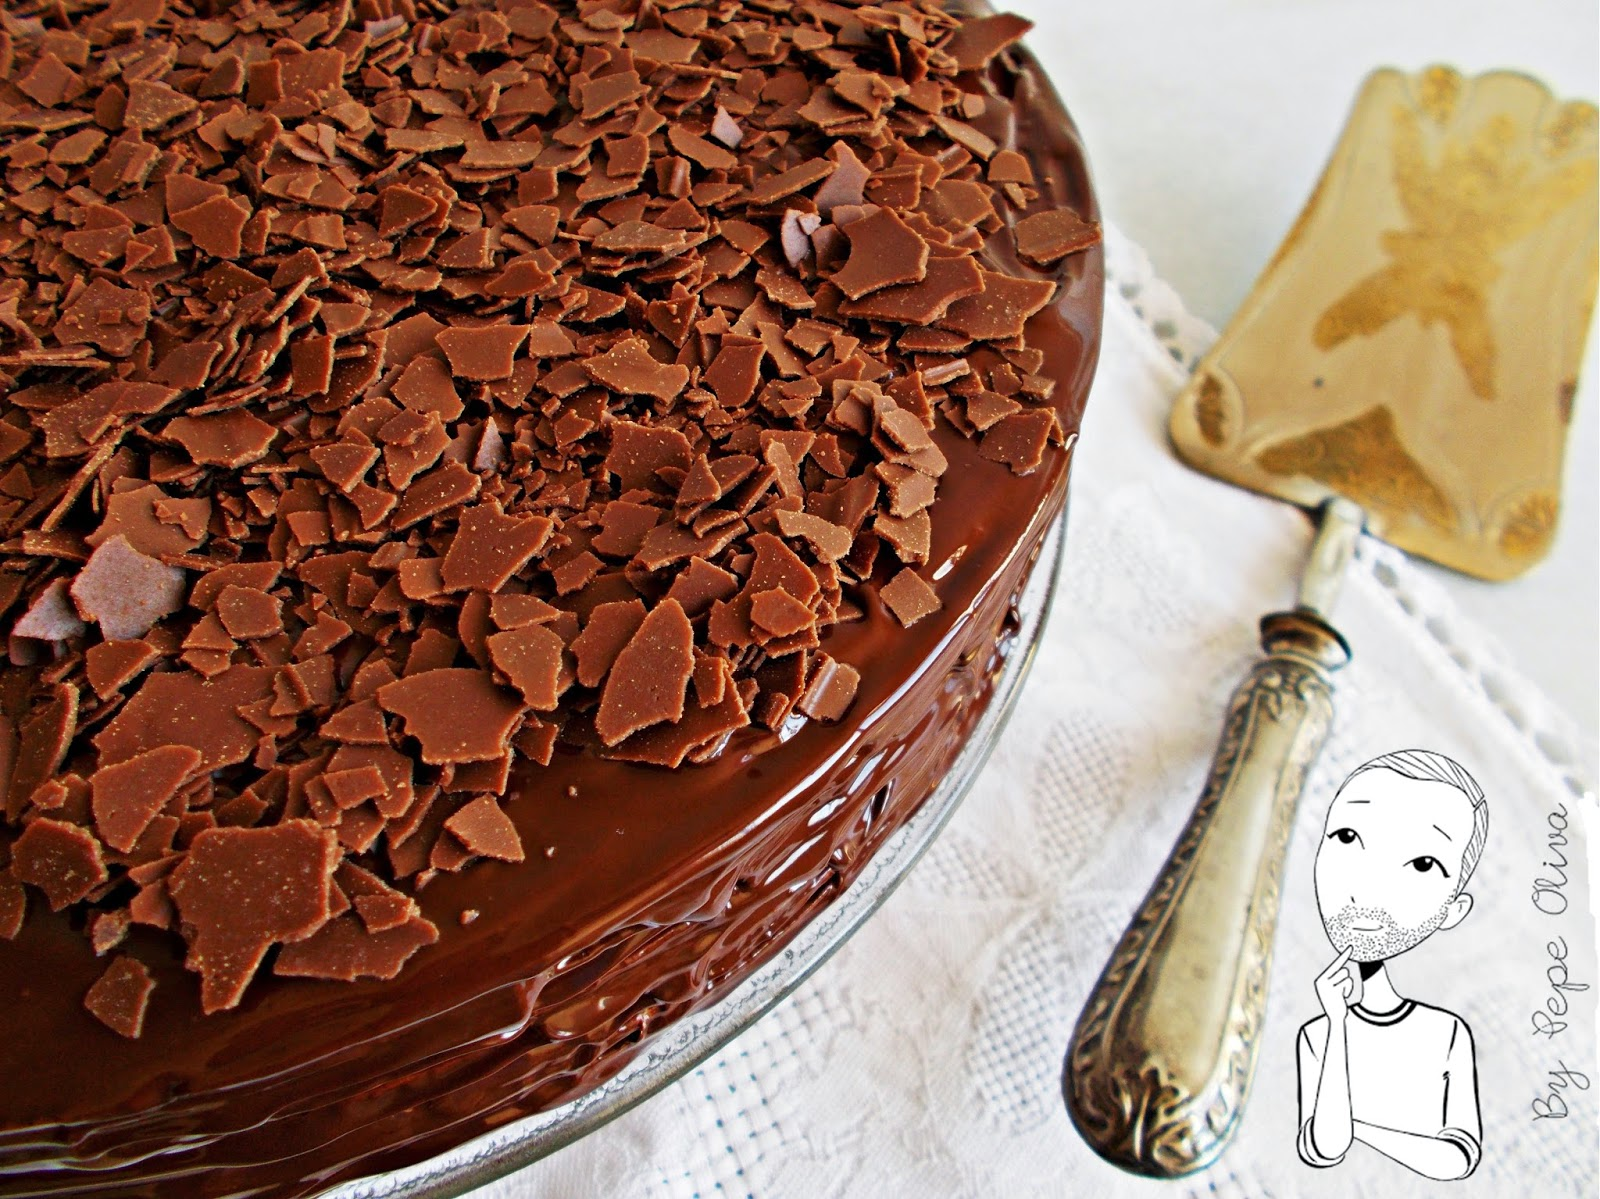 cocina-postre-dulce-pastel-tarta-huesitos-chocolate-obleas-nutella-1